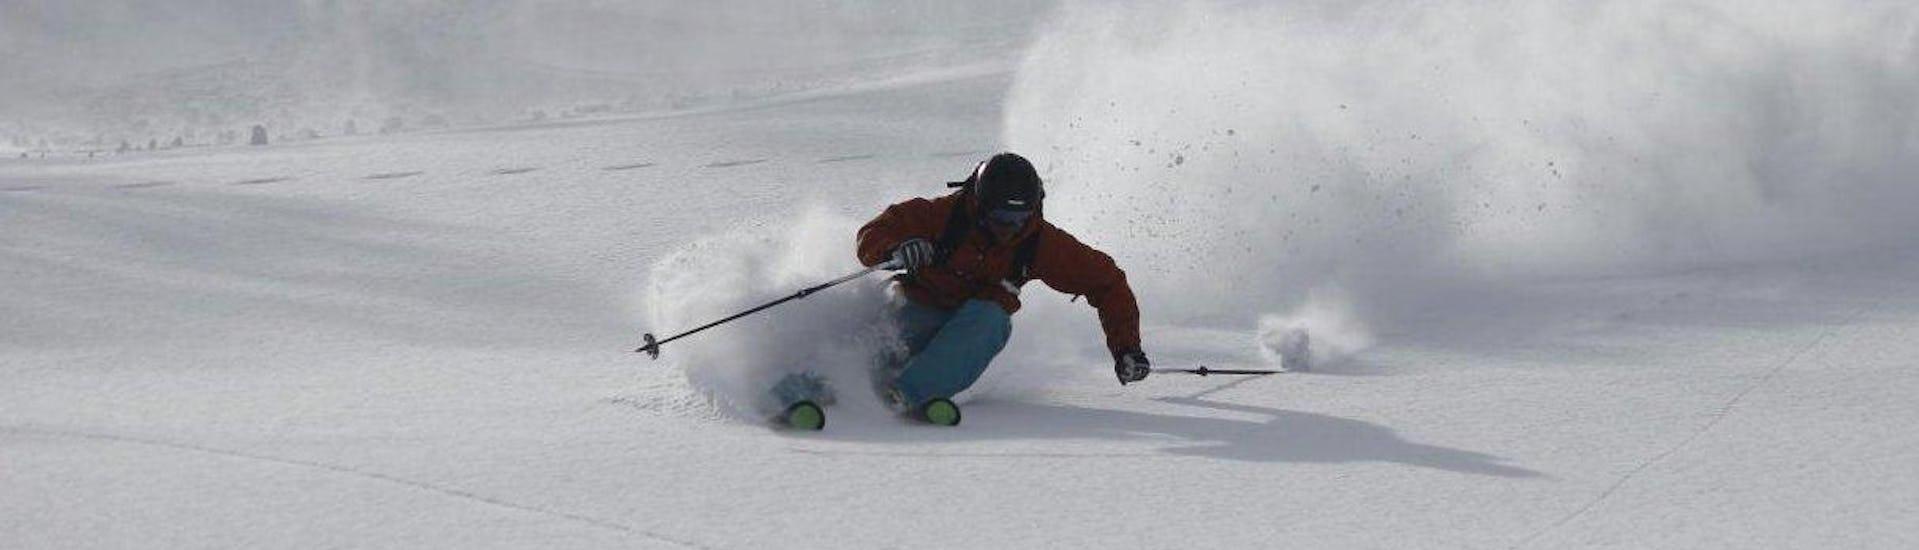 Personal Training - Olympia-Skiworld Innsbruck (max. 2)